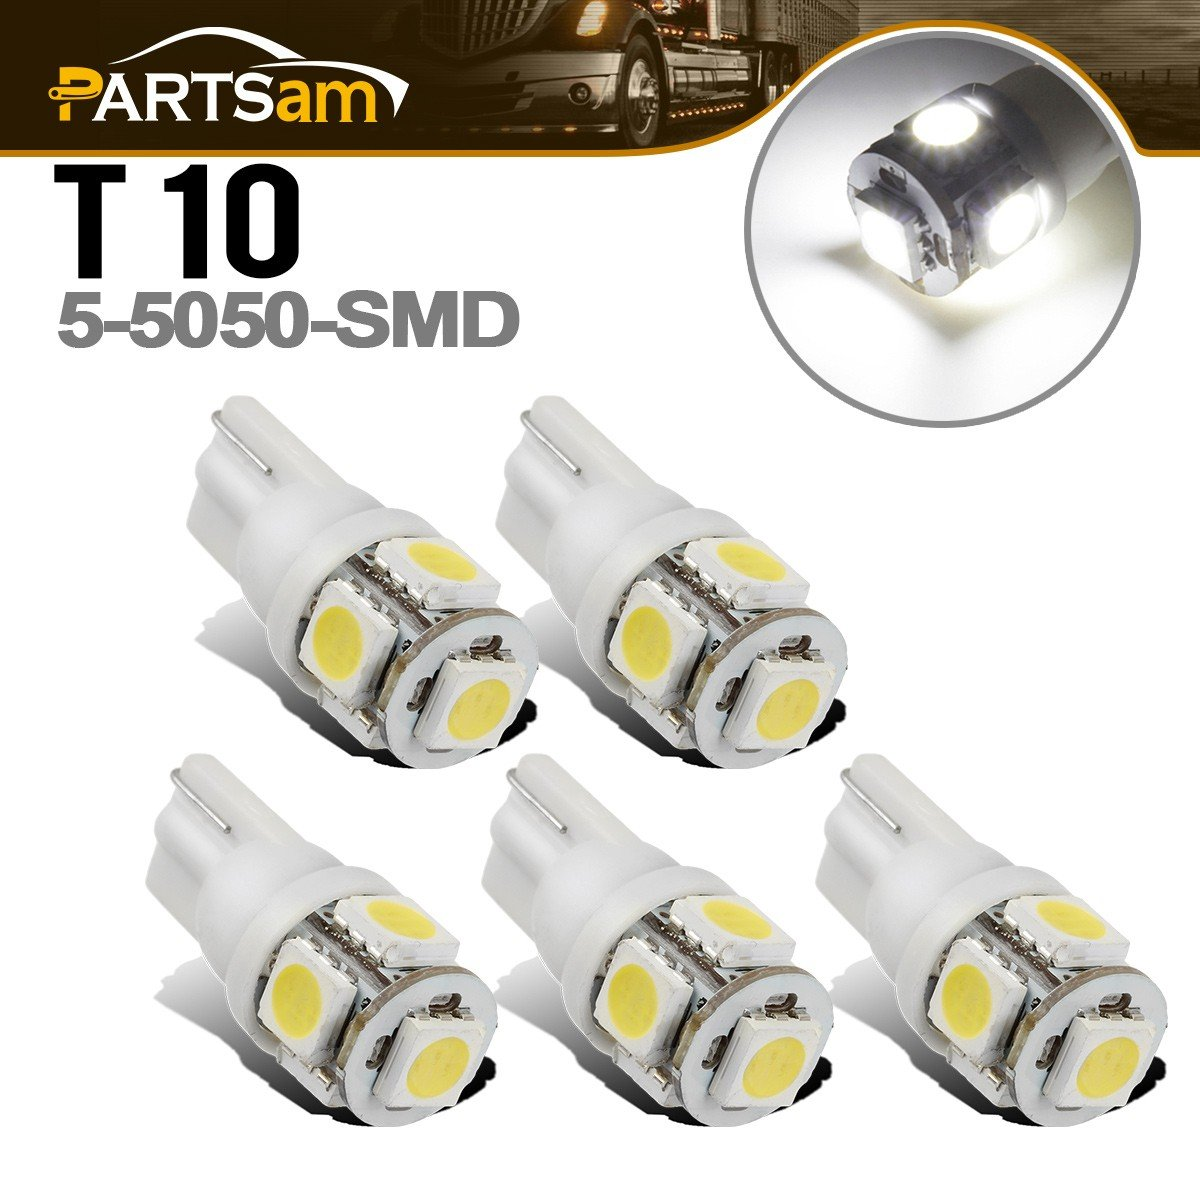 Partsam T10 LED Light Bulbs 5X White 161 168 194 Wedge Base Lights 5-5050-SMD for Cab Roof Running Marker Light LED Backup License Plate Parking Turn Signal Light